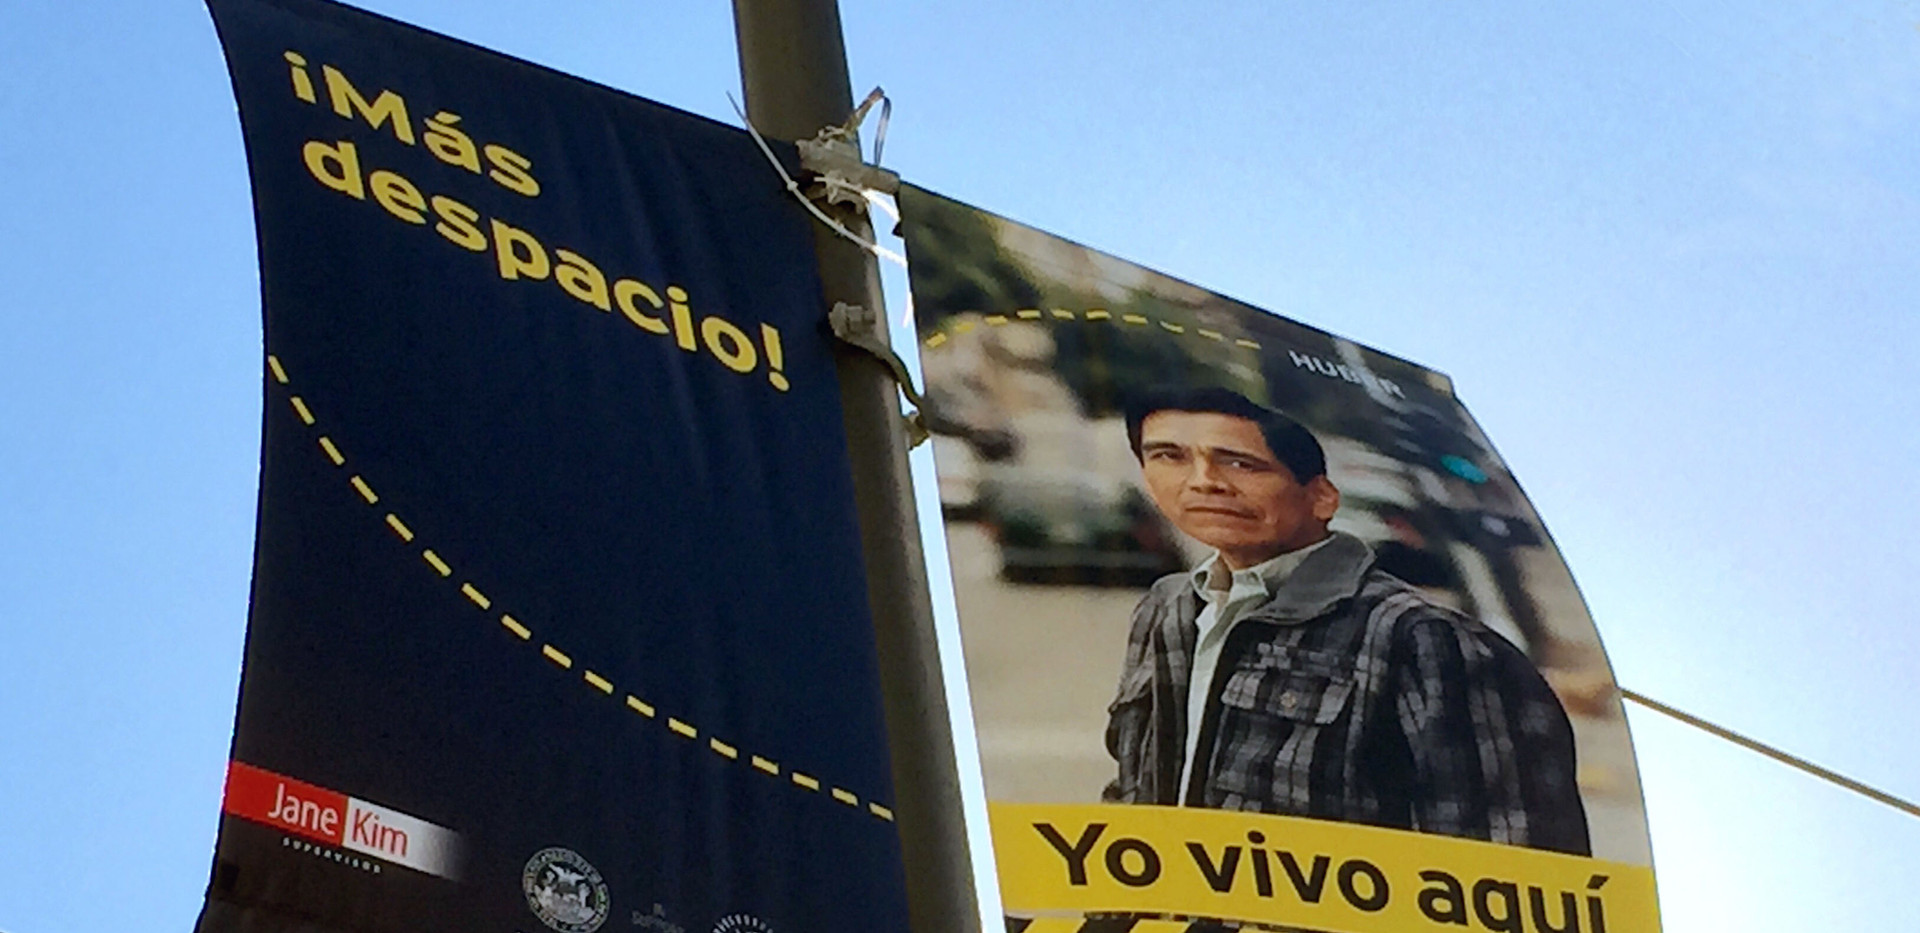 Photo of street pole ad